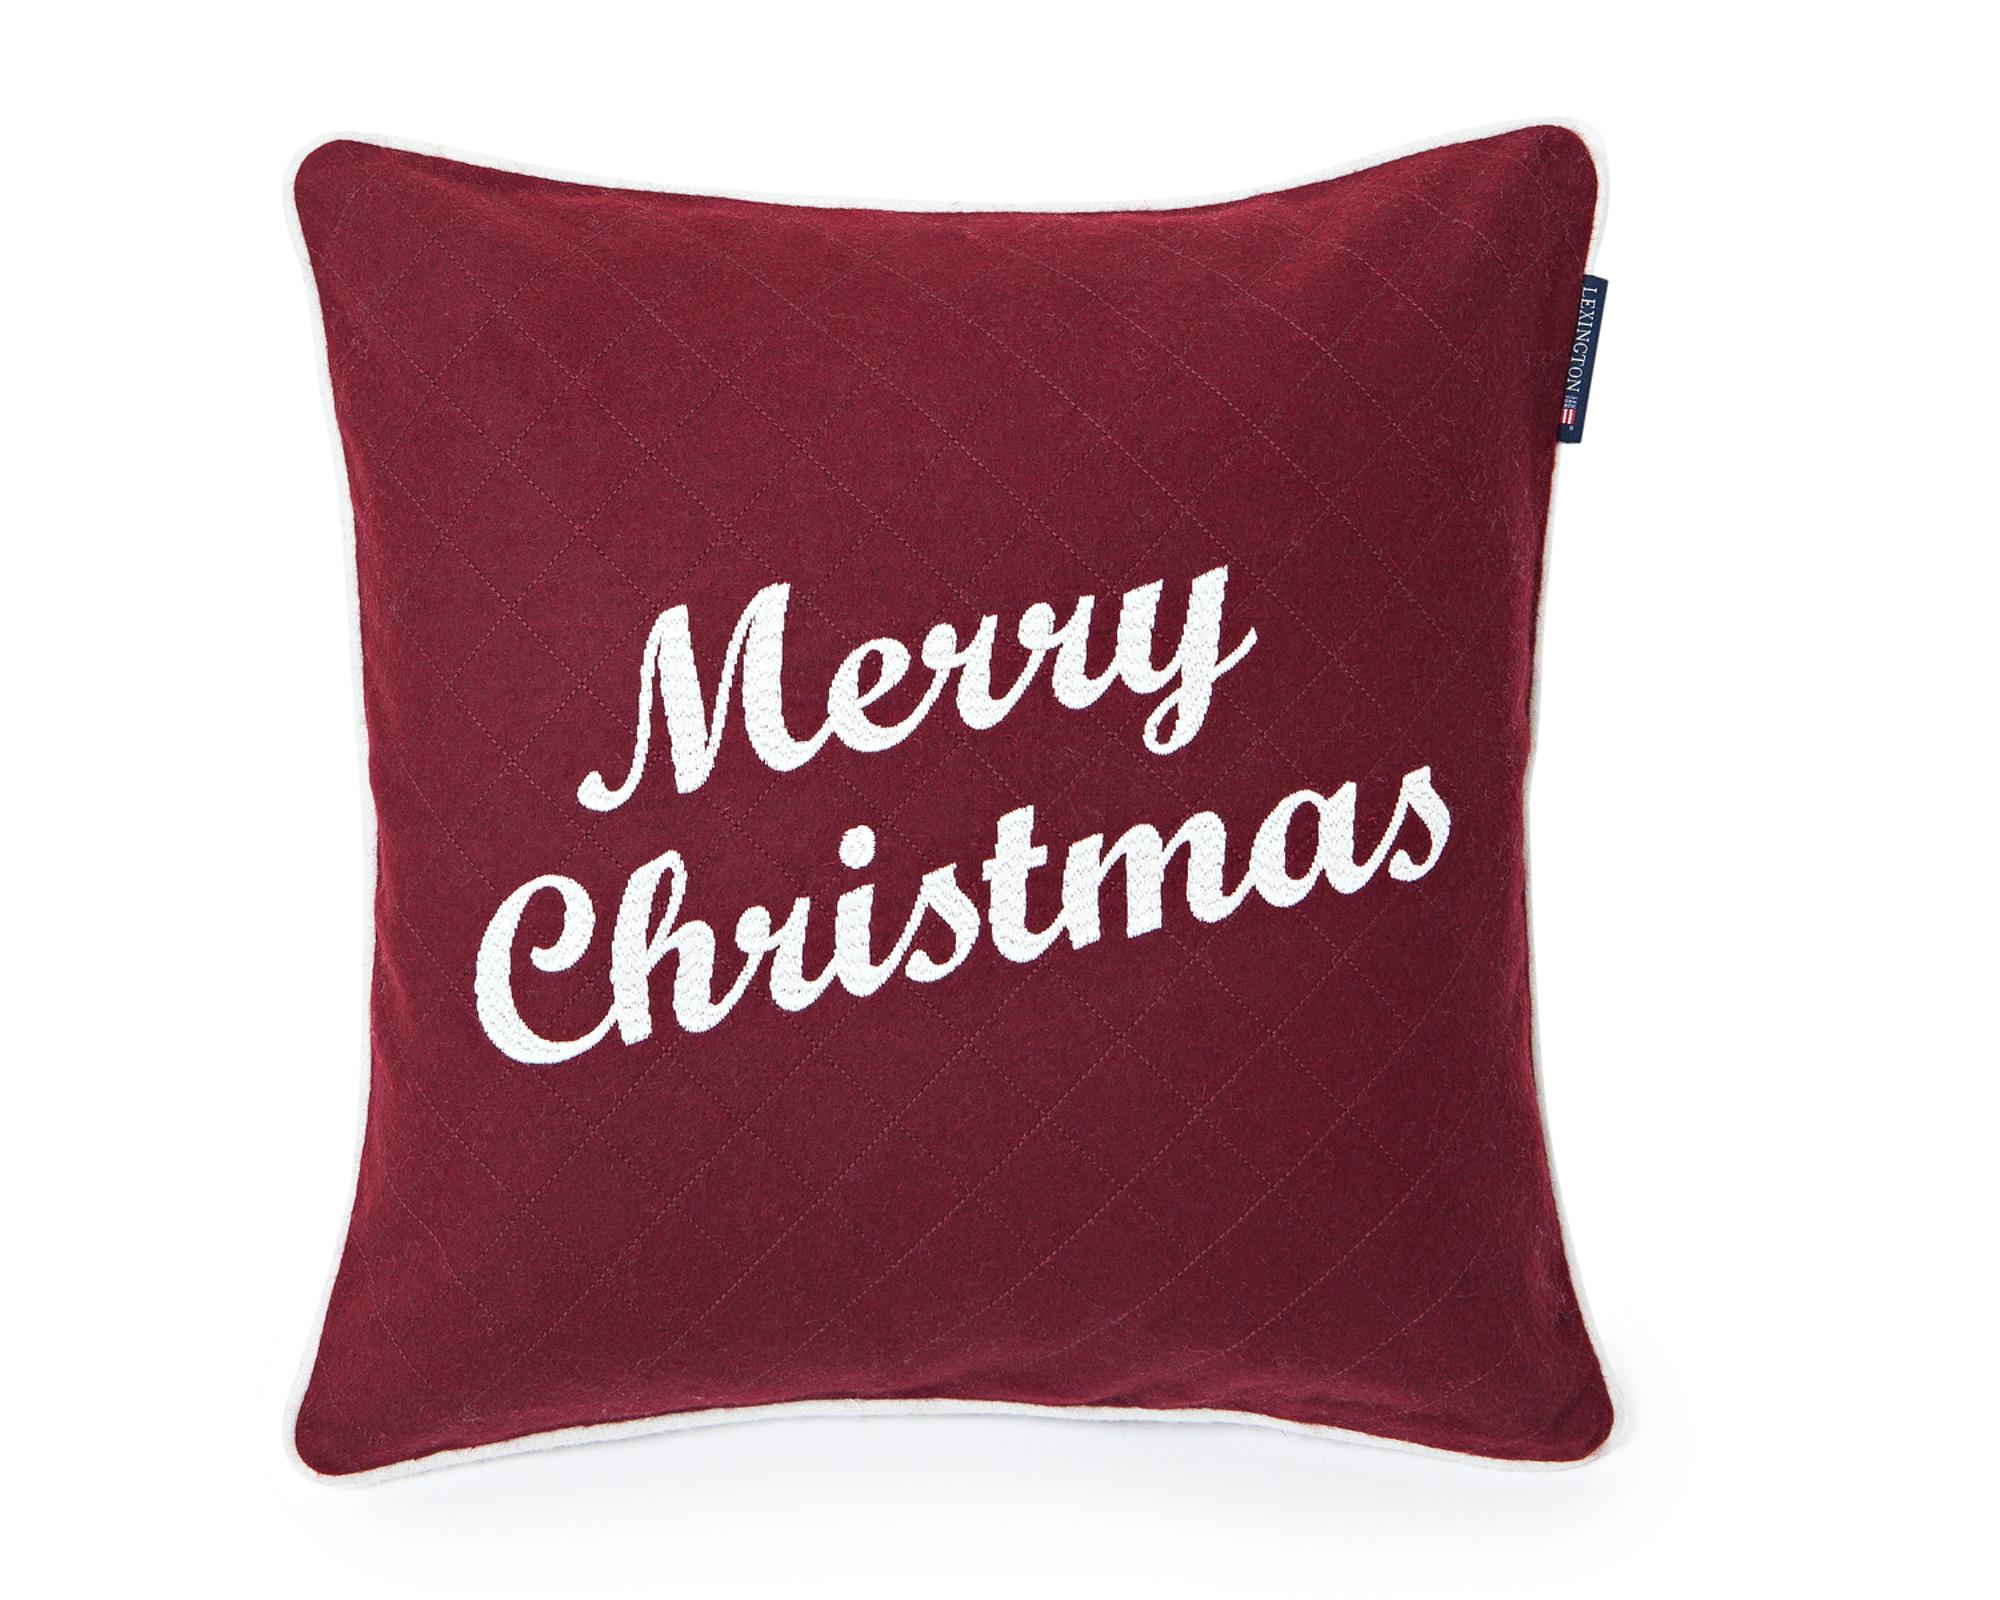 Merry Christmas Sham, Red